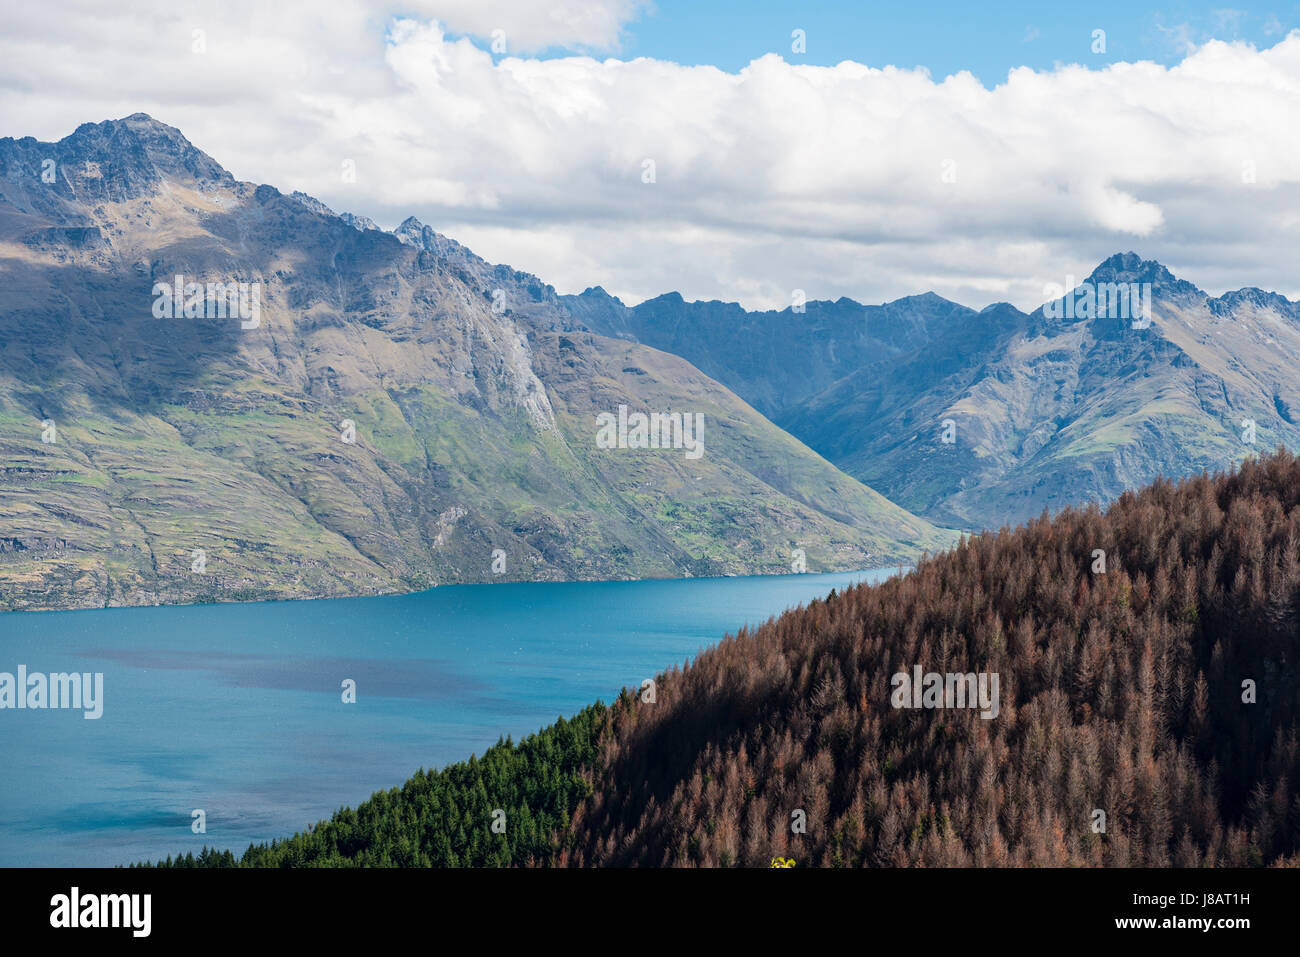 Blick auf Lake Wakatipu, Ben Lomond, Otago, Südinsel, Neuseeland Stockfoto